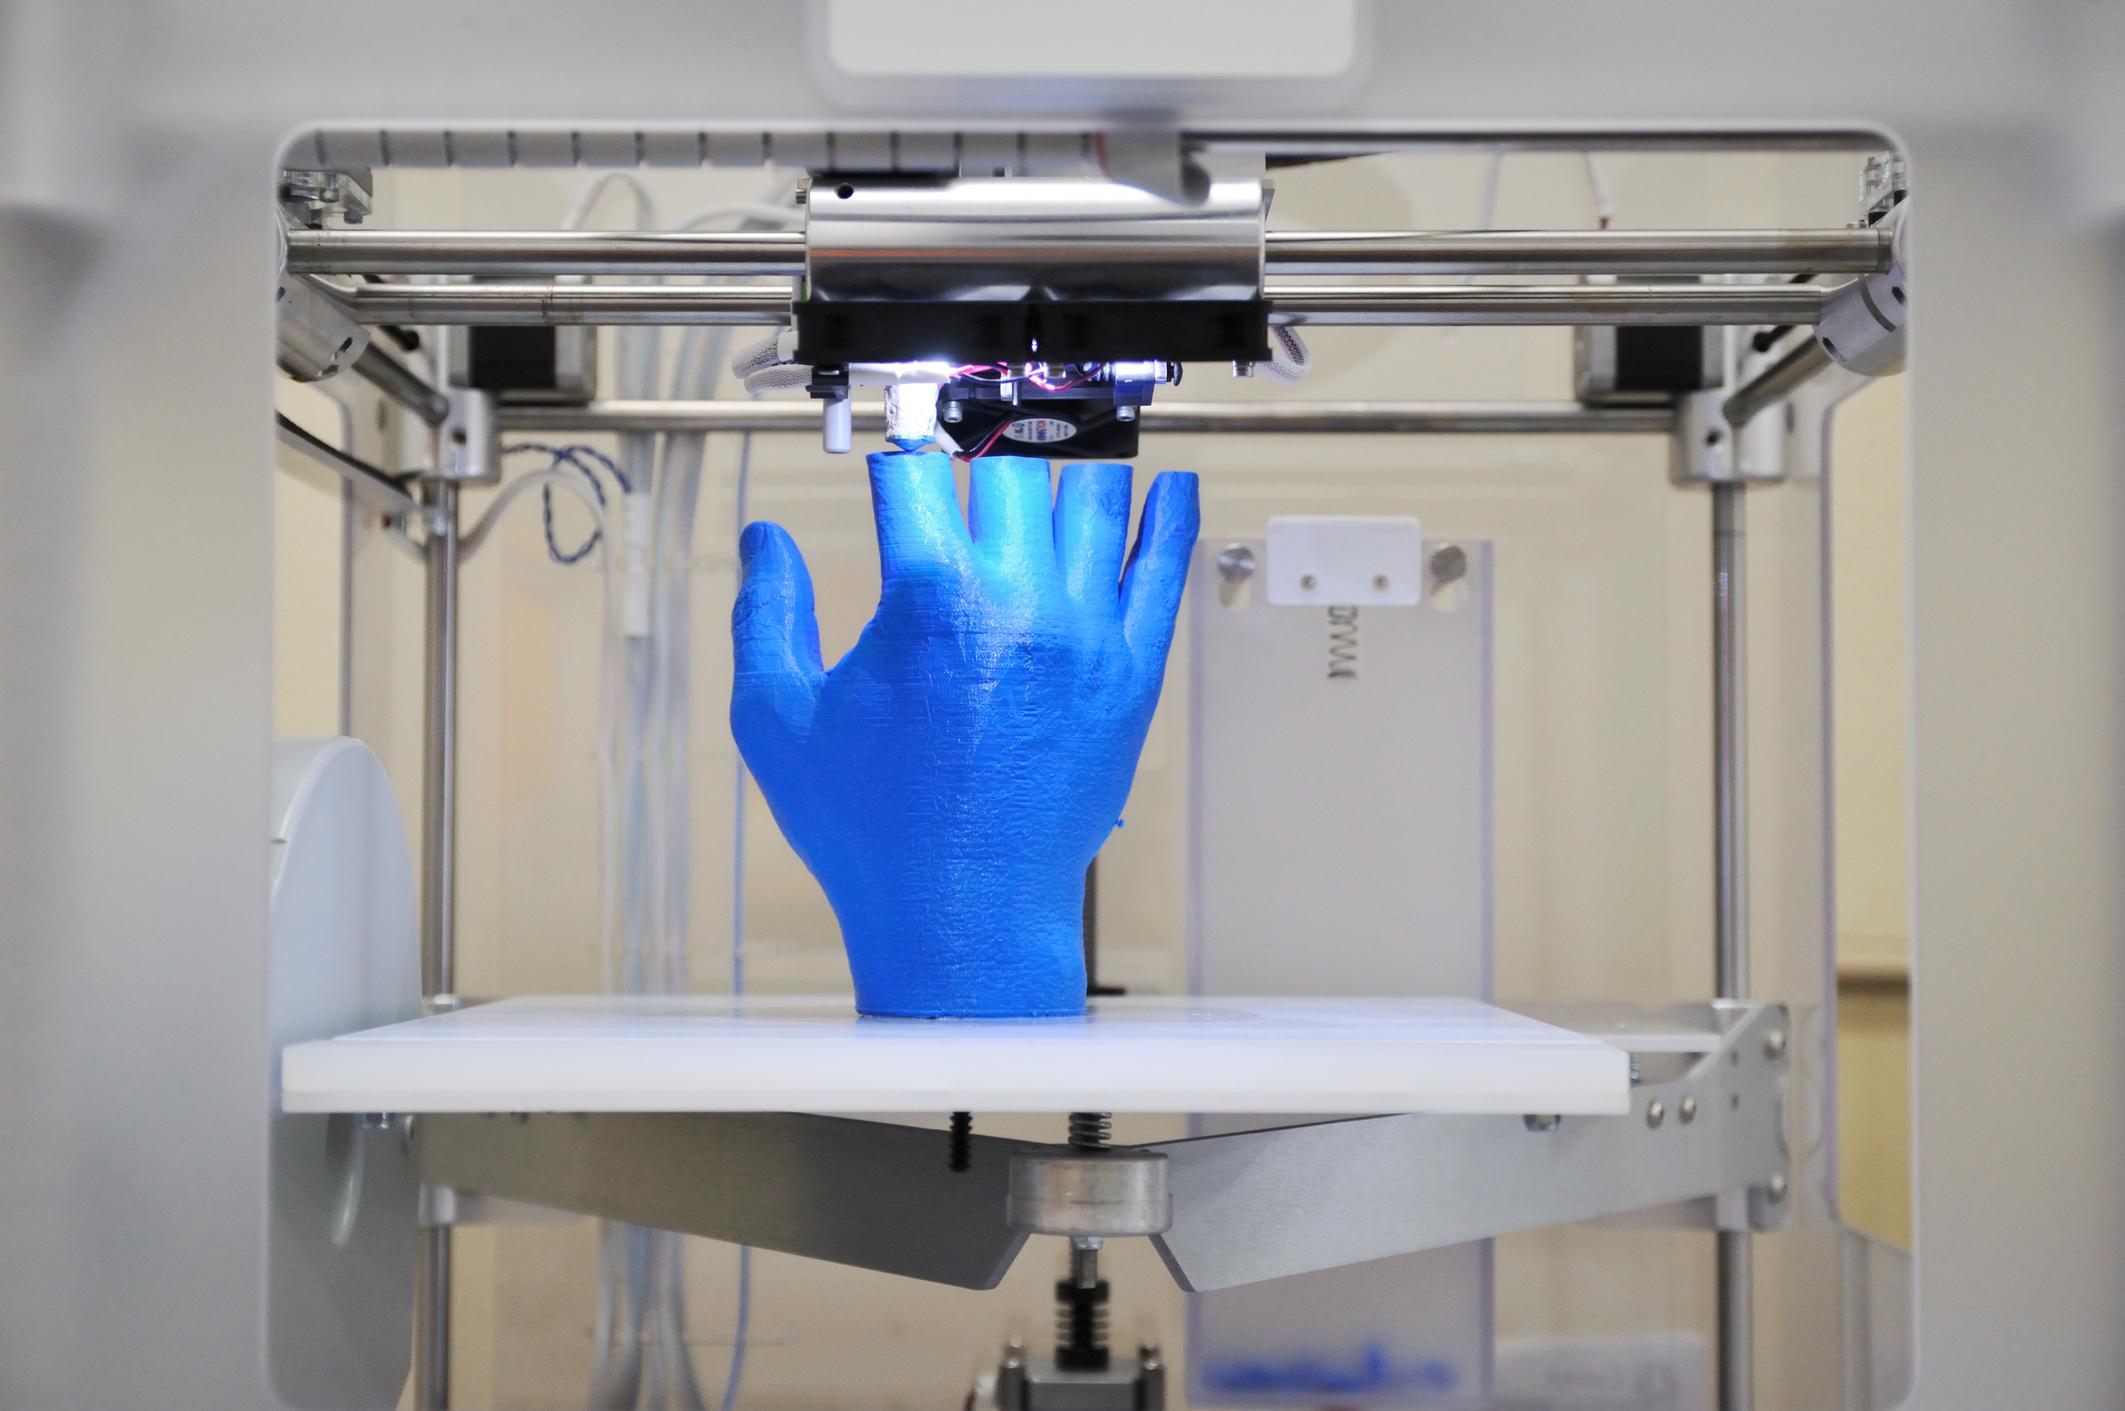 3D printer printing a blue hand.